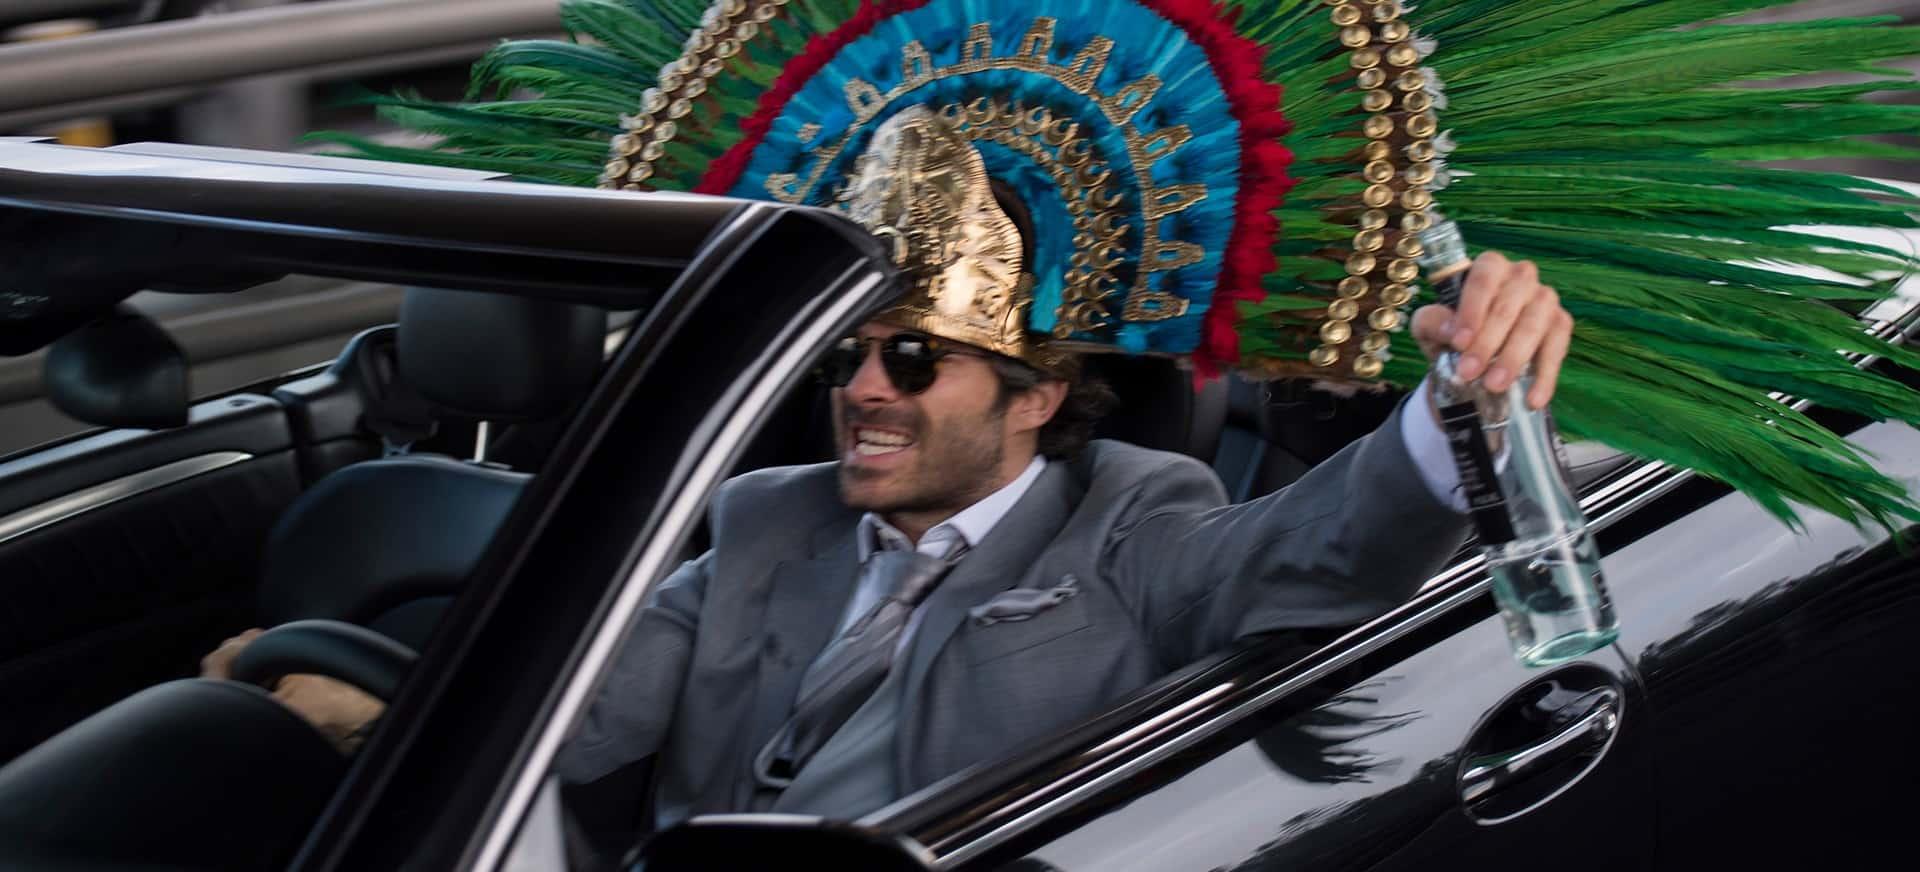 Maratón de cine mexicano en streaming